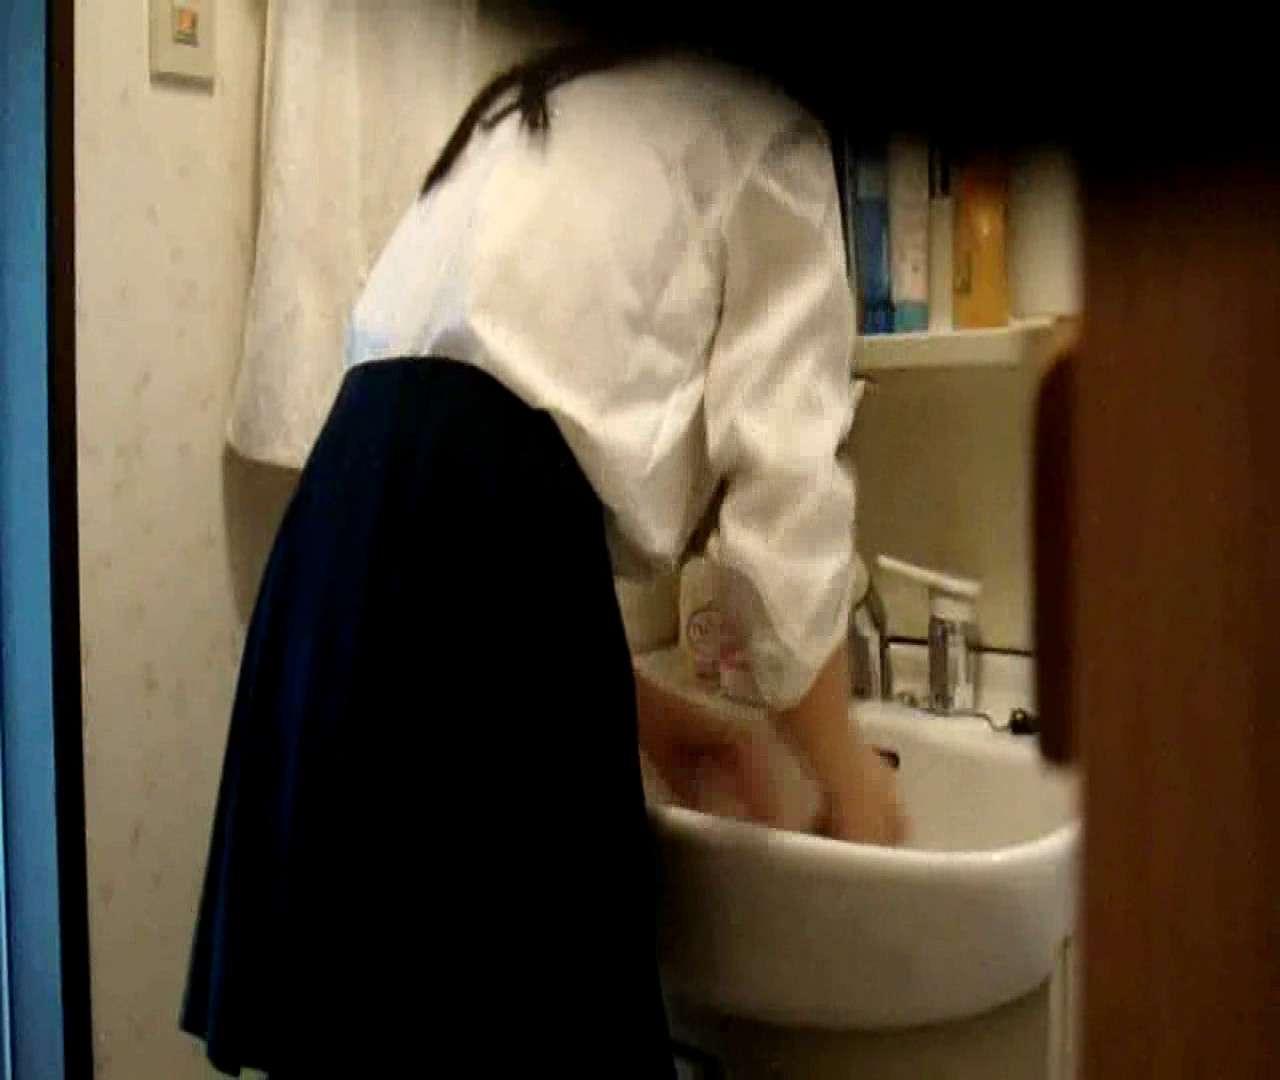 vol.5 まどかが帰宅後の洗顔後にブラを洗ってます。 ギャル達 | 民家  112枚 13